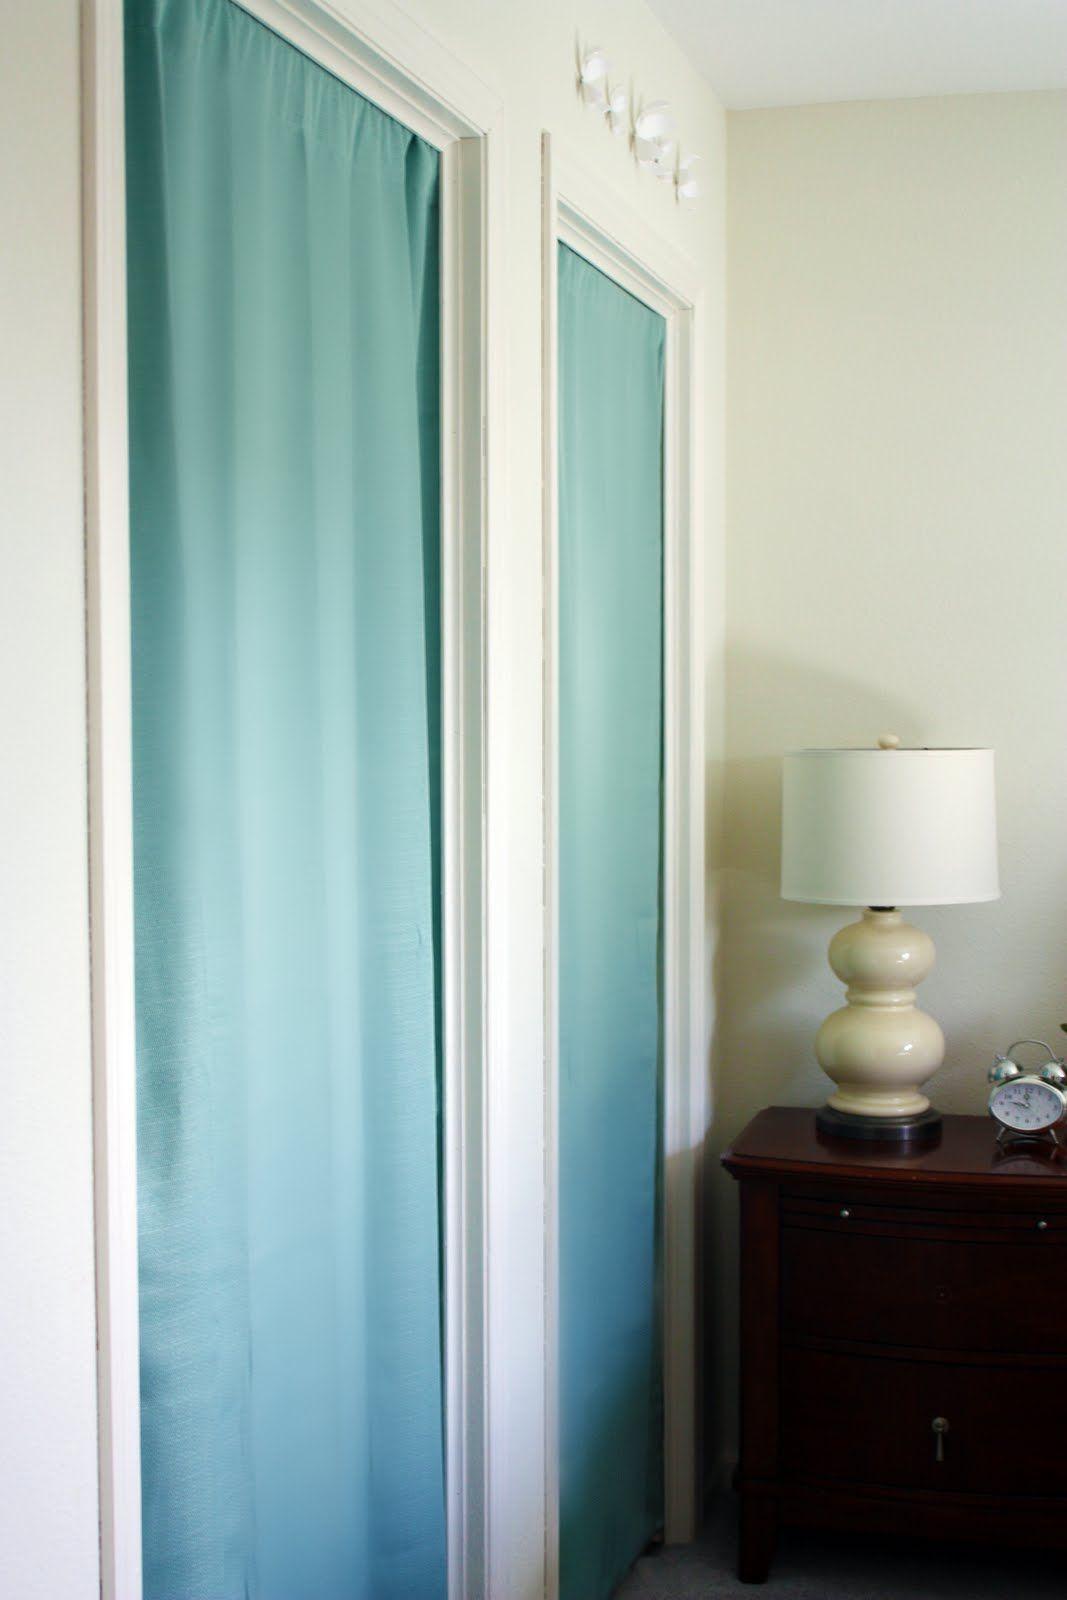 Ikea panel curtain closet door - Panel Curtains Closet 17 Best Images About Closet Door Solutions On Pinterest Window Panels Doors